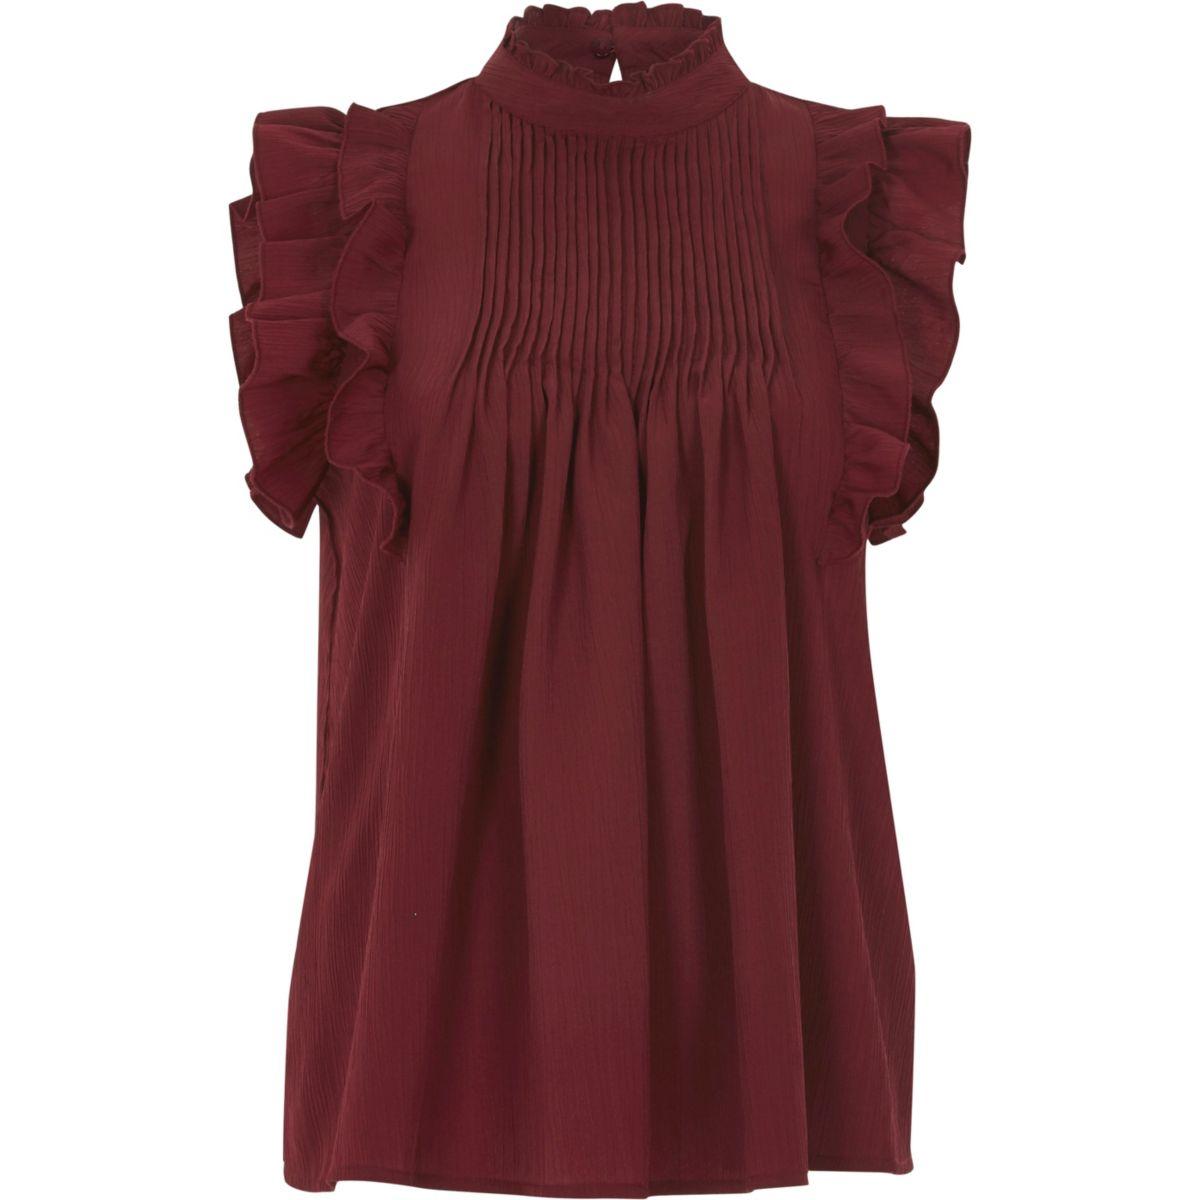 Dark red frill high neck sleeveless top